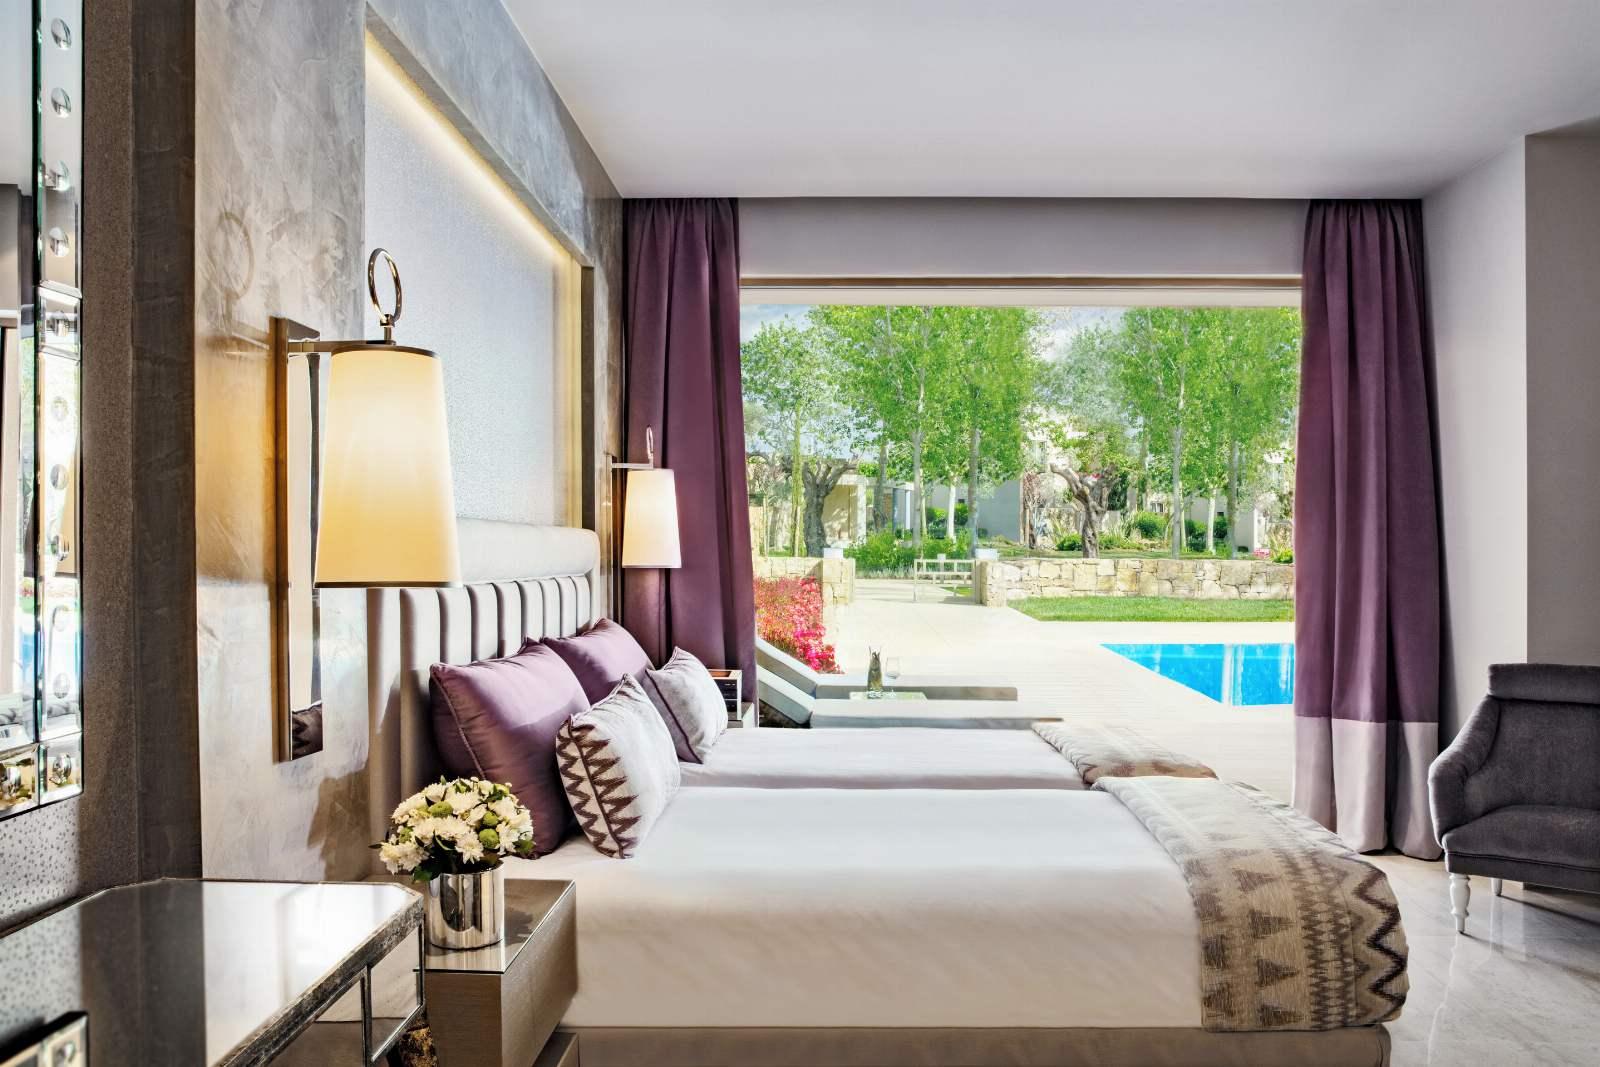 Sani Asterias Three Bedroom Deluxe Suite - Private Pool